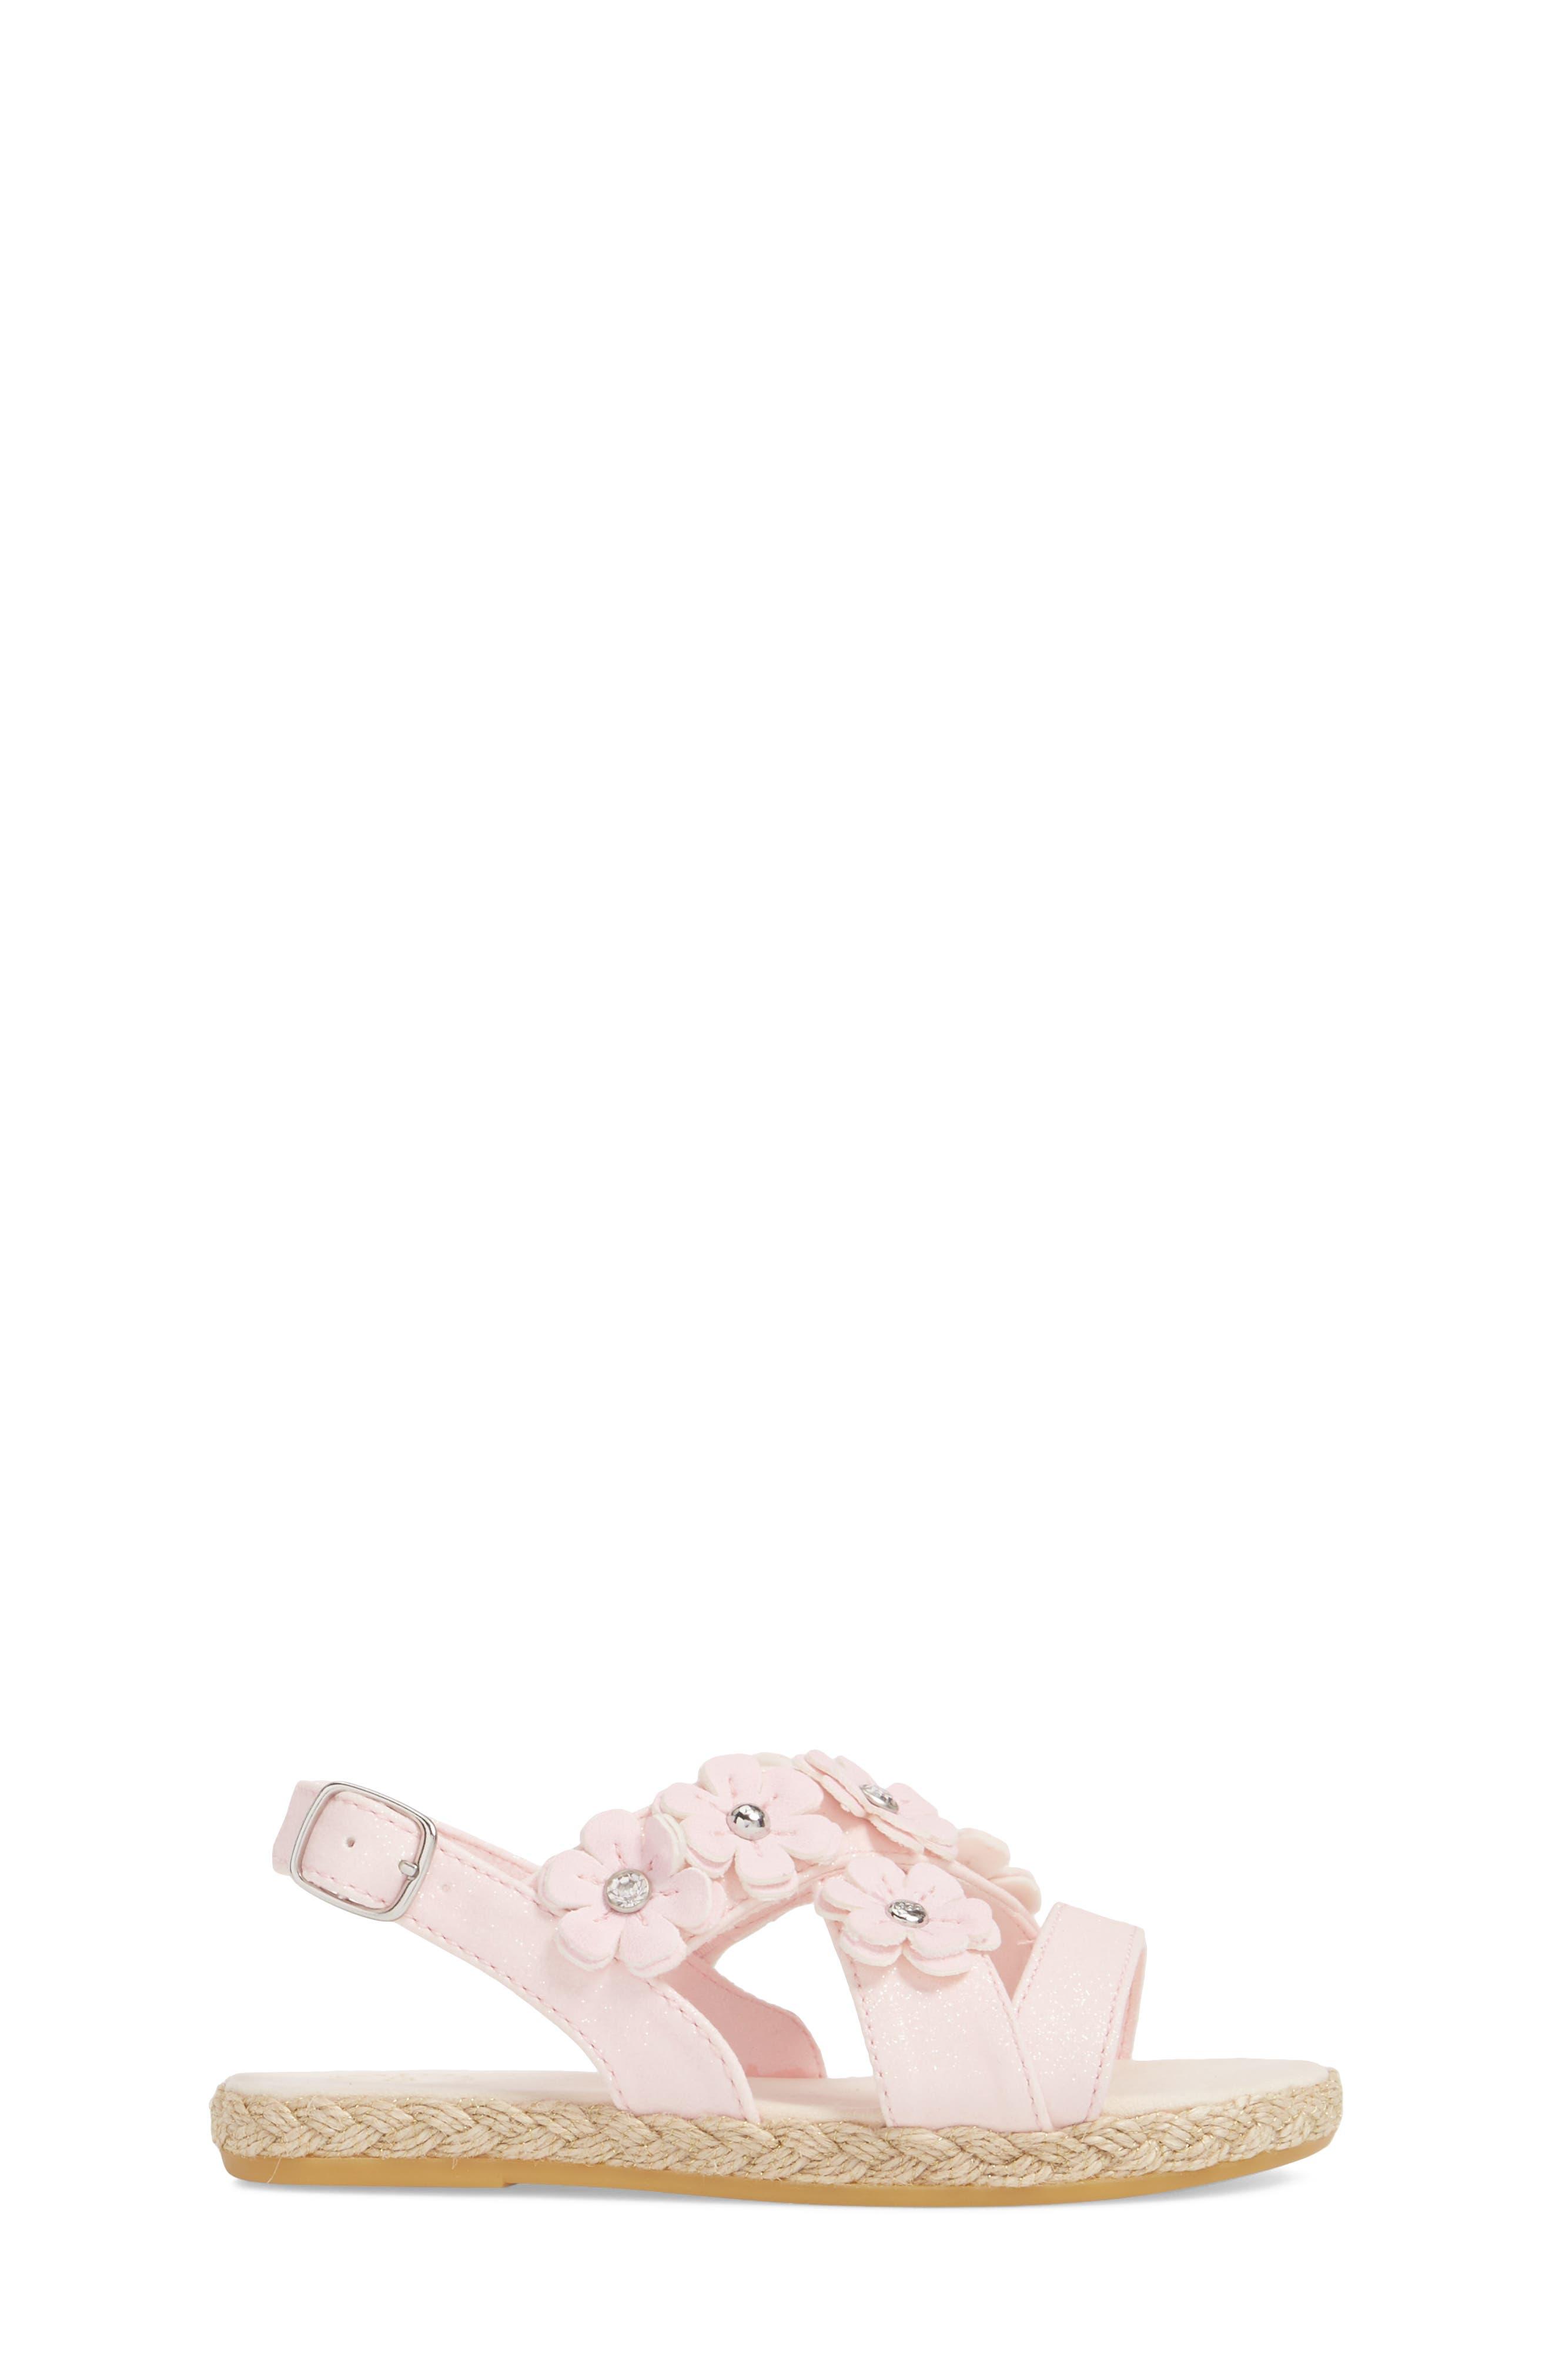 UGG<SUP>®</SUP>, Allairey Sparkles Espadrille Sandal, Alternate thumbnail 3, color, SEASHELL PINK